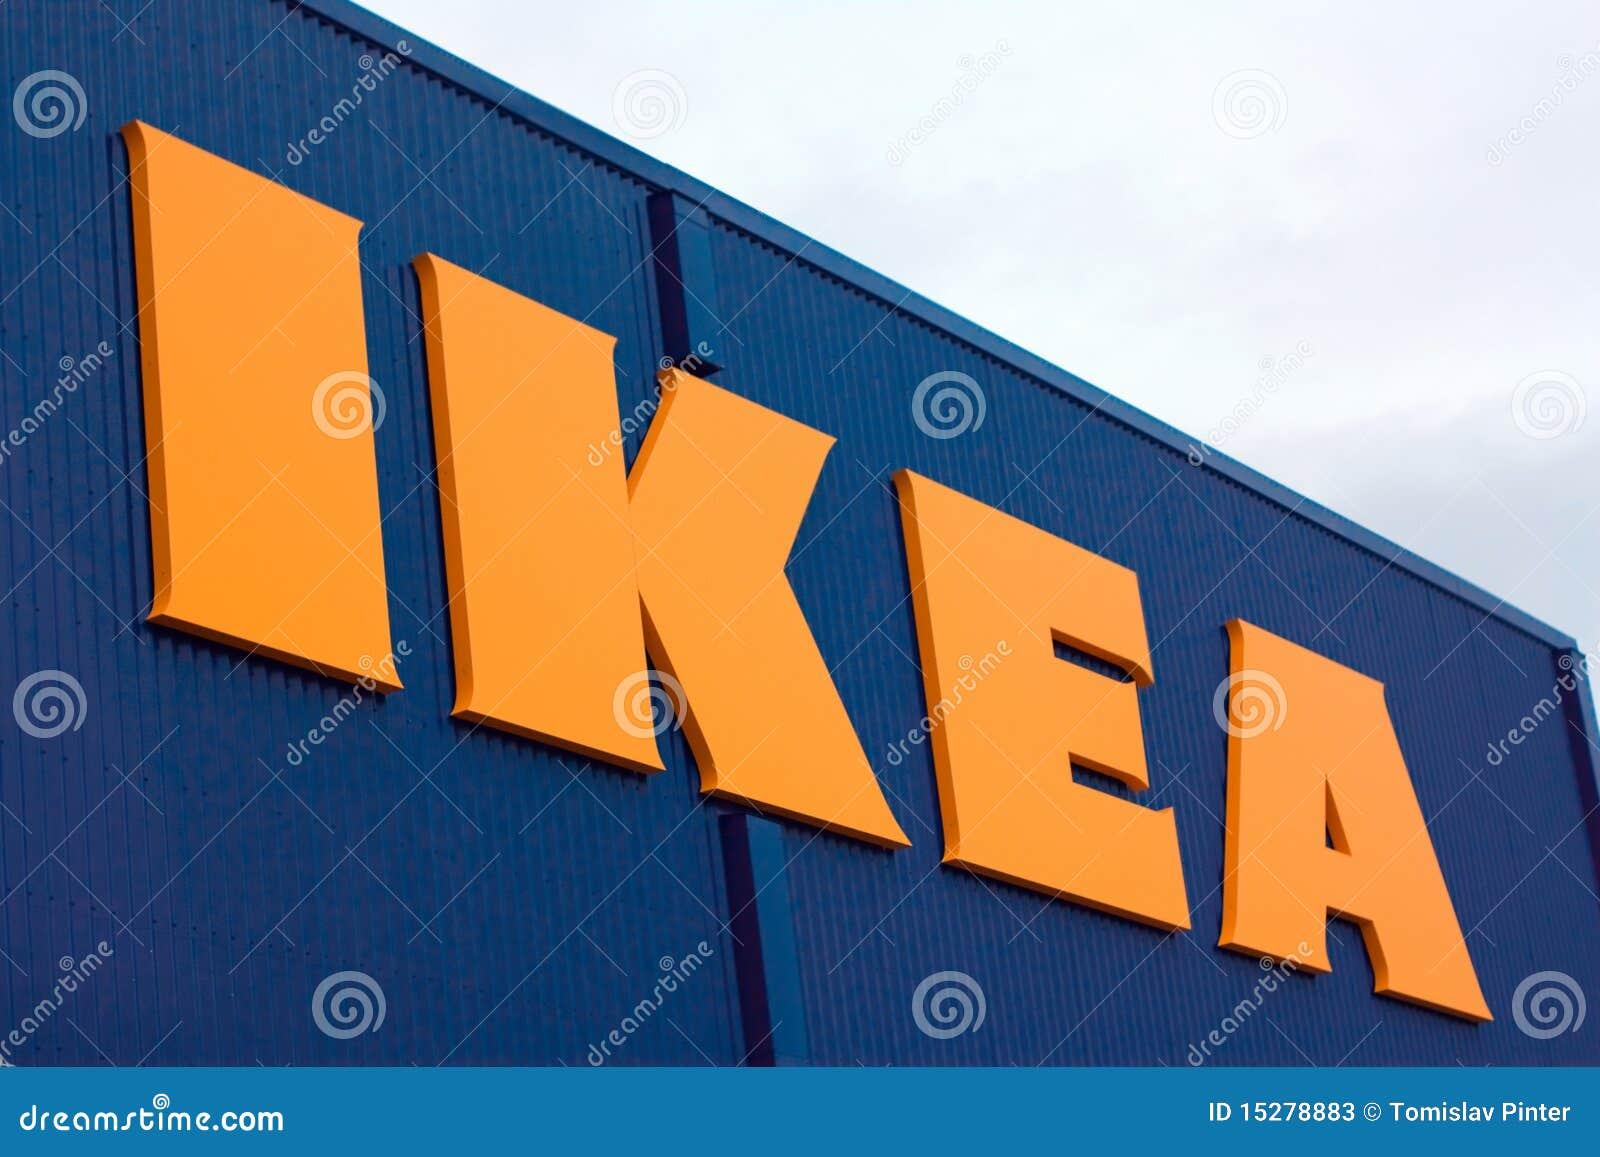 Ikea store editorial stock photo image 15278883 for Ikea stehhocker